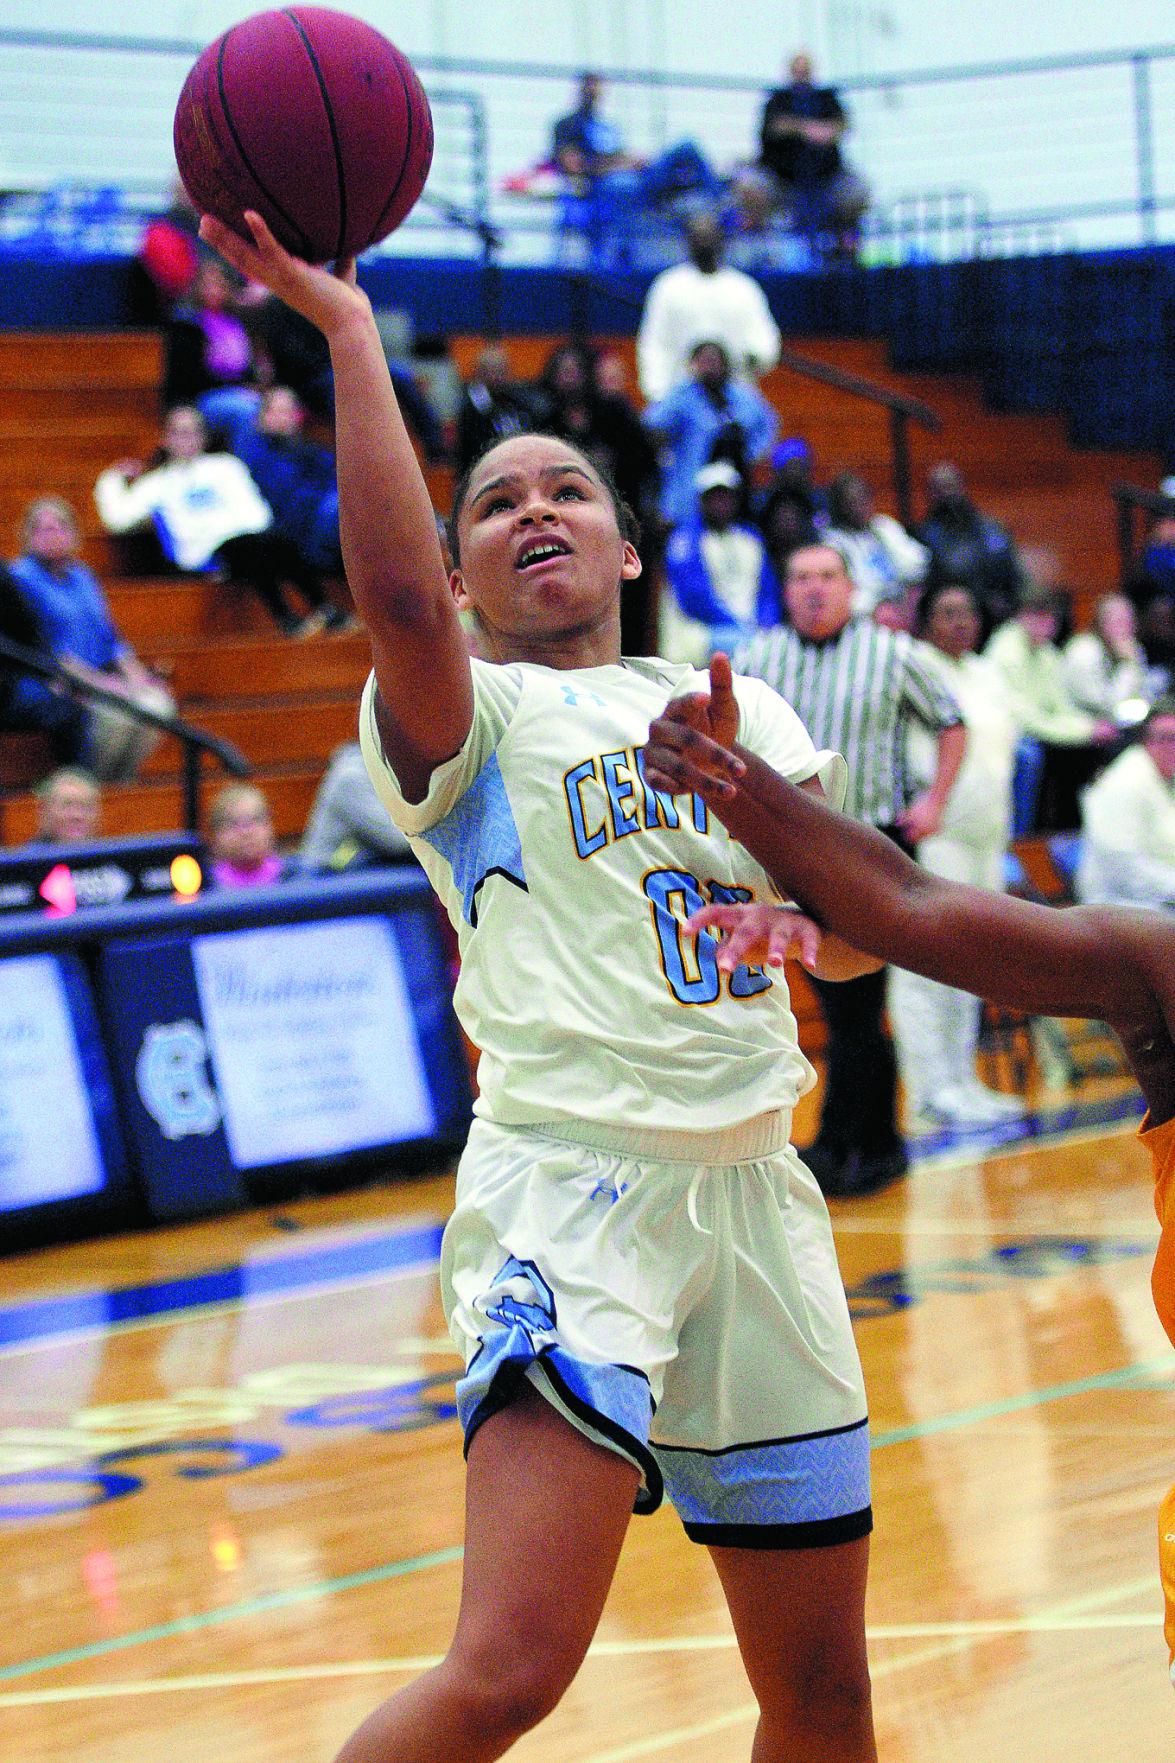 GIRLS' BASKETBALL: Lady Bruins down Franklin County